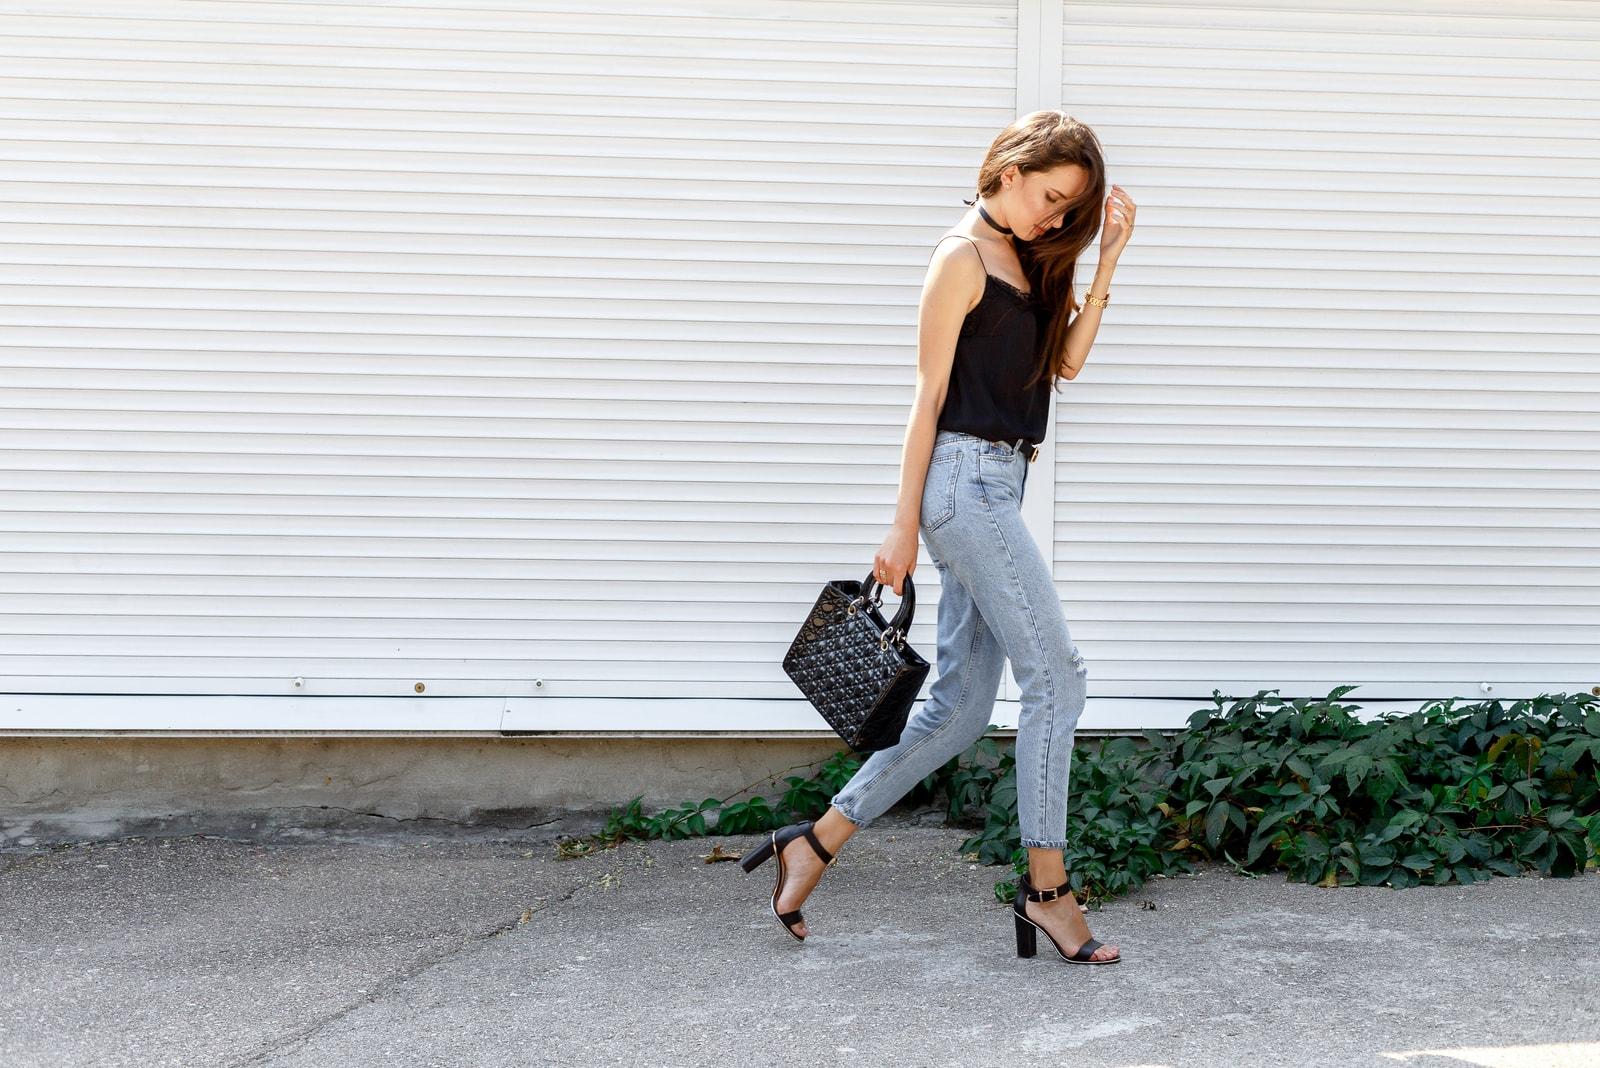 stylish woman wearing heel sandals